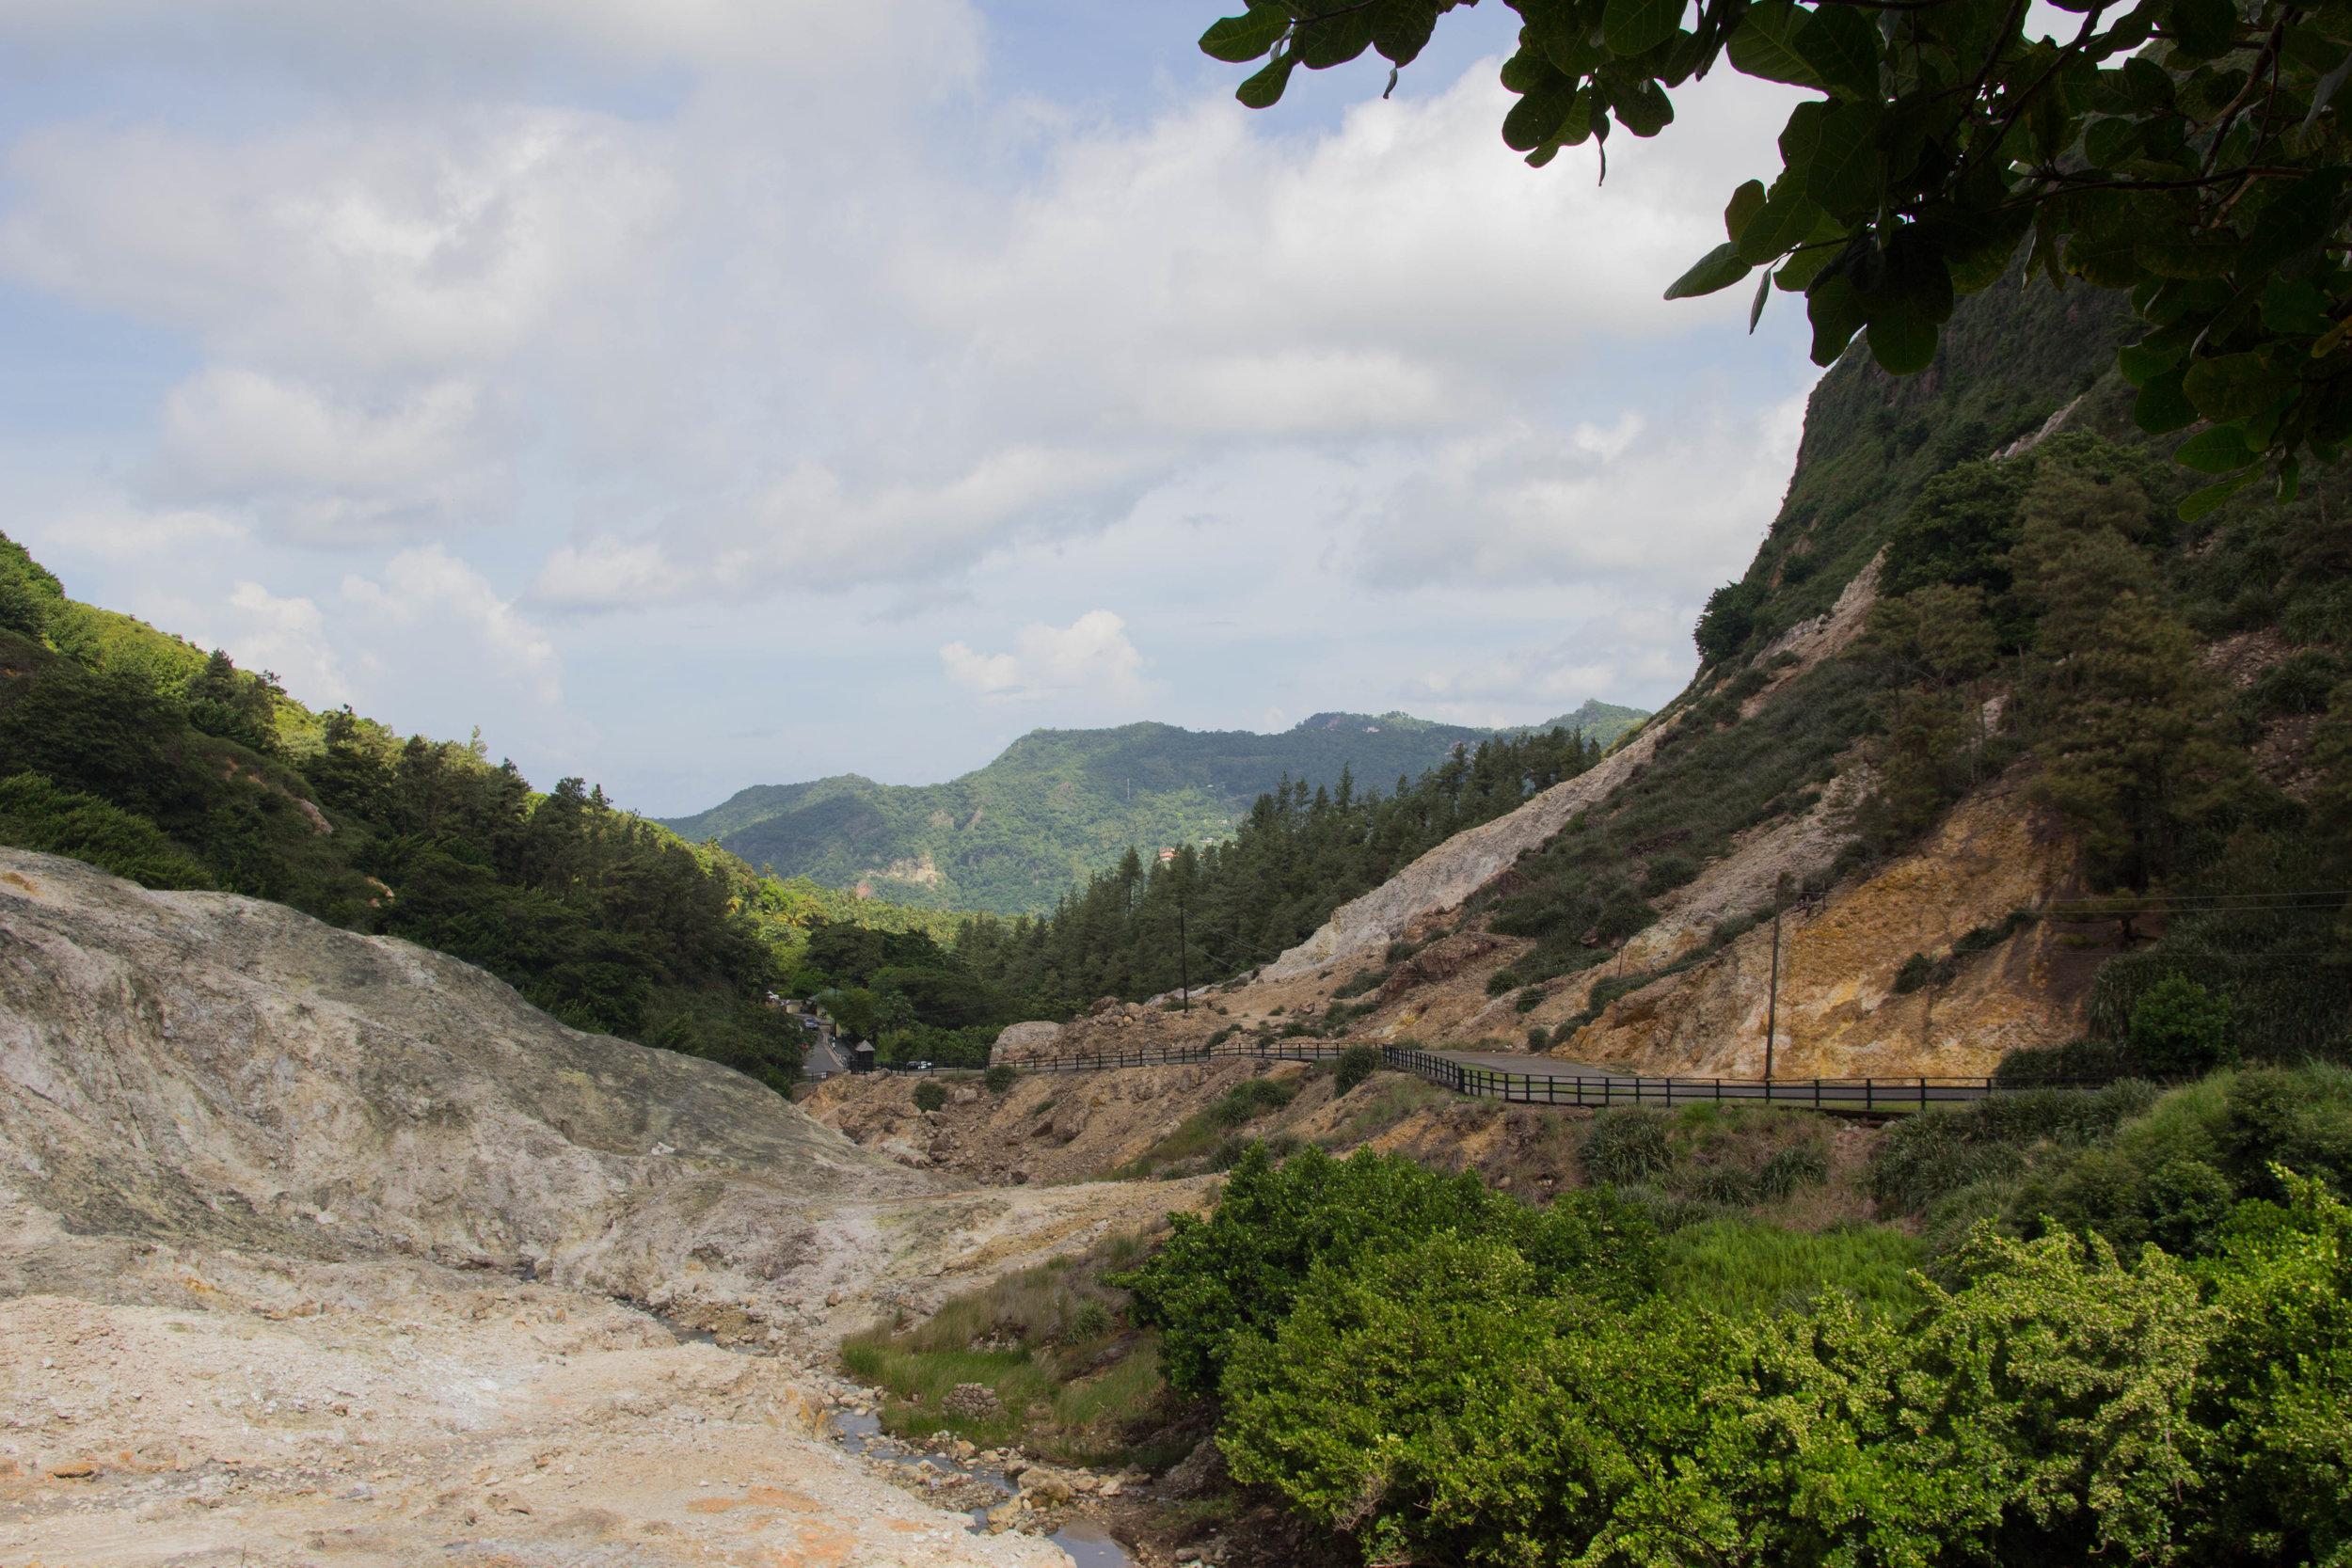 saint lucia travel guide, jade mountain, villa piton, mud baths, drive through volcano, botanical gardens, what to do in saint lucia, where to eat in saint lucia, where to stay in saint lucia, honeymoon spot